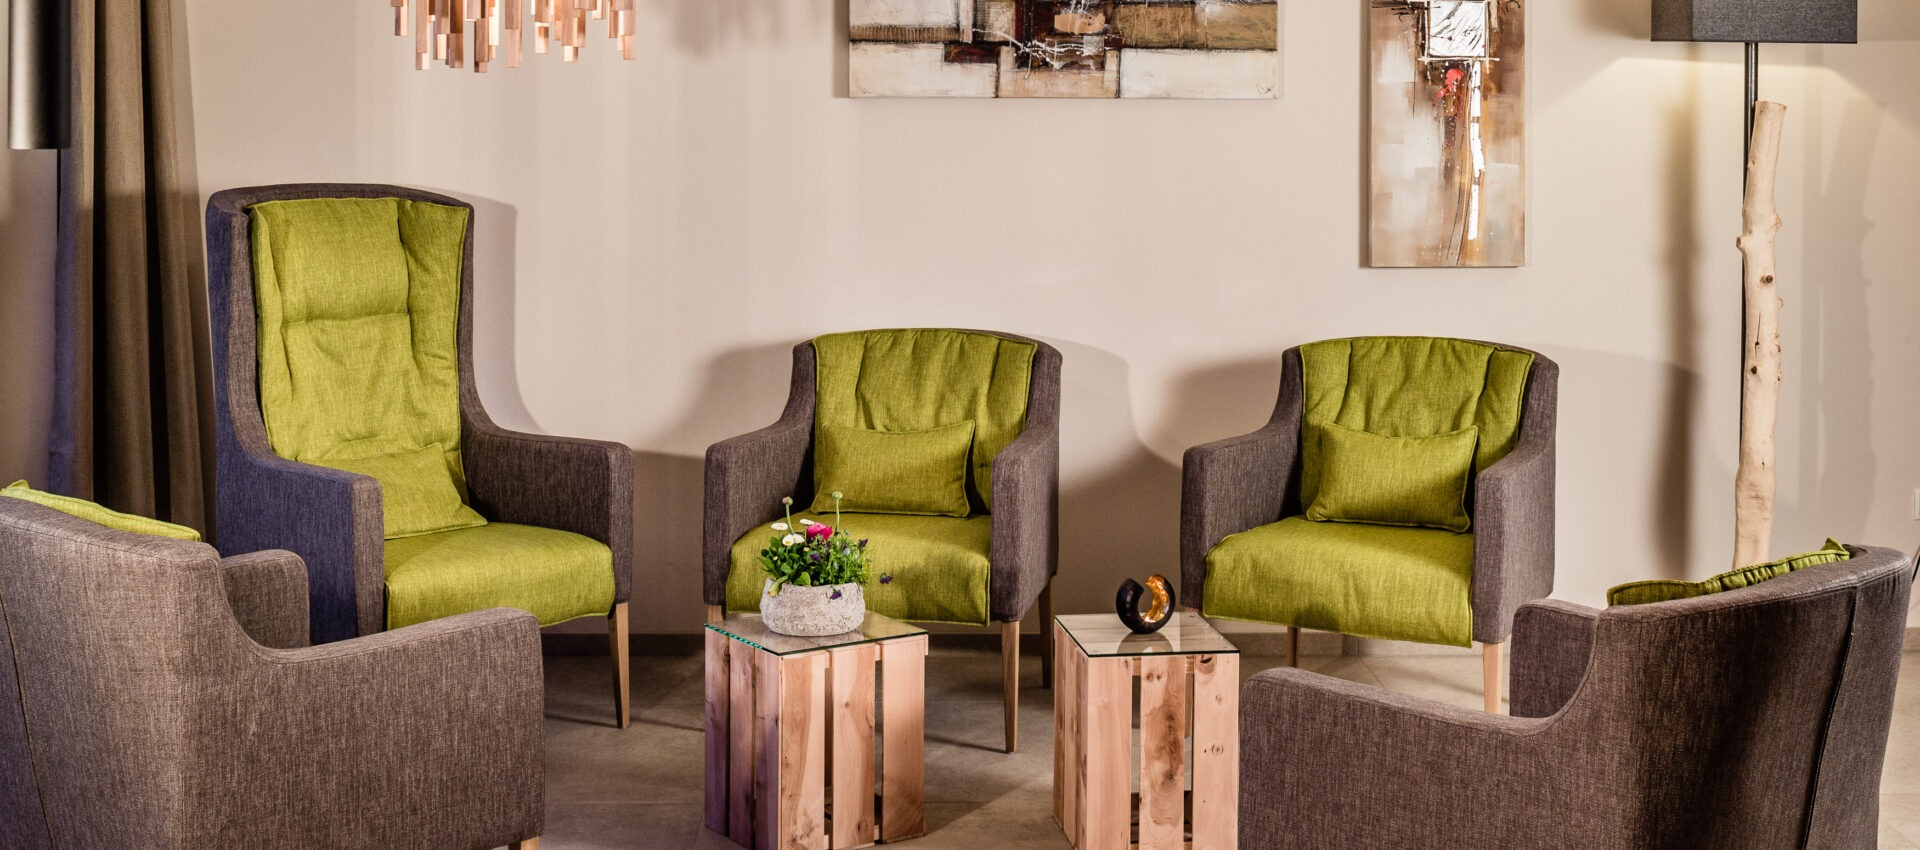 Bar 4 Sterne Hotel in Lana Pfeiss - Meran - Südtirol